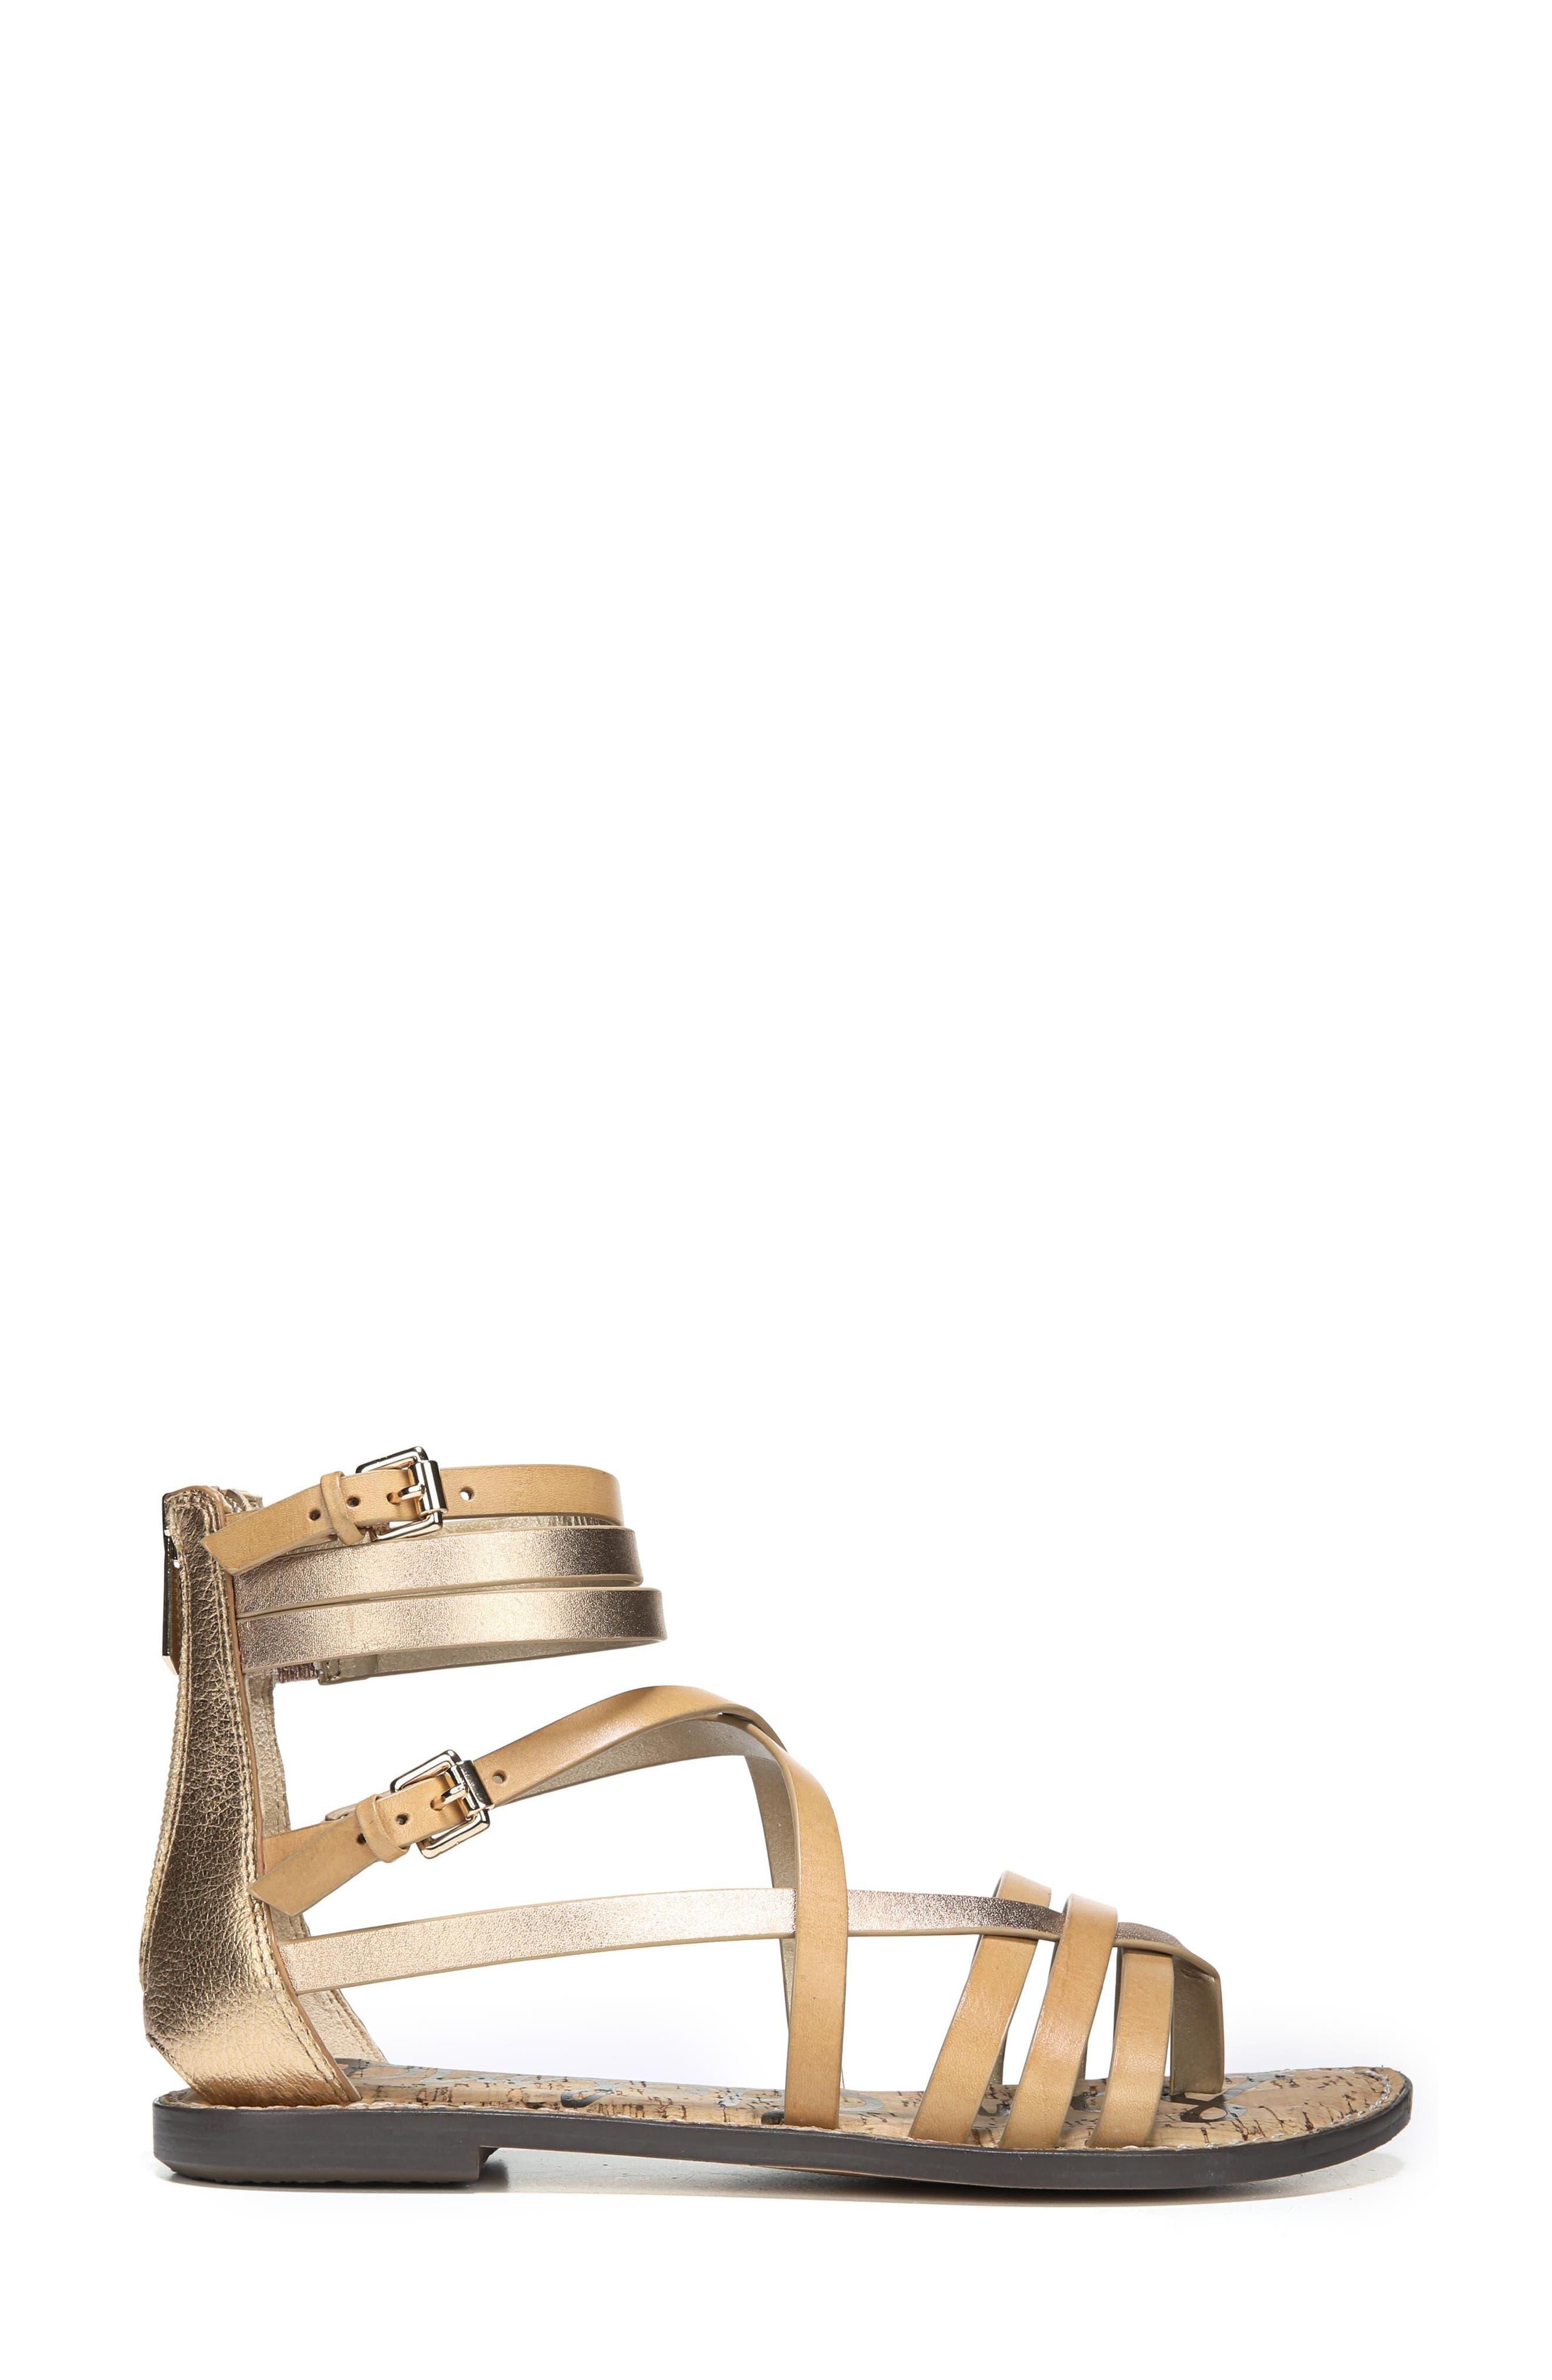 Ganesa Strappy Sandal,                             Alternate thumbnail 3, color,                             Golden Caramel Leather